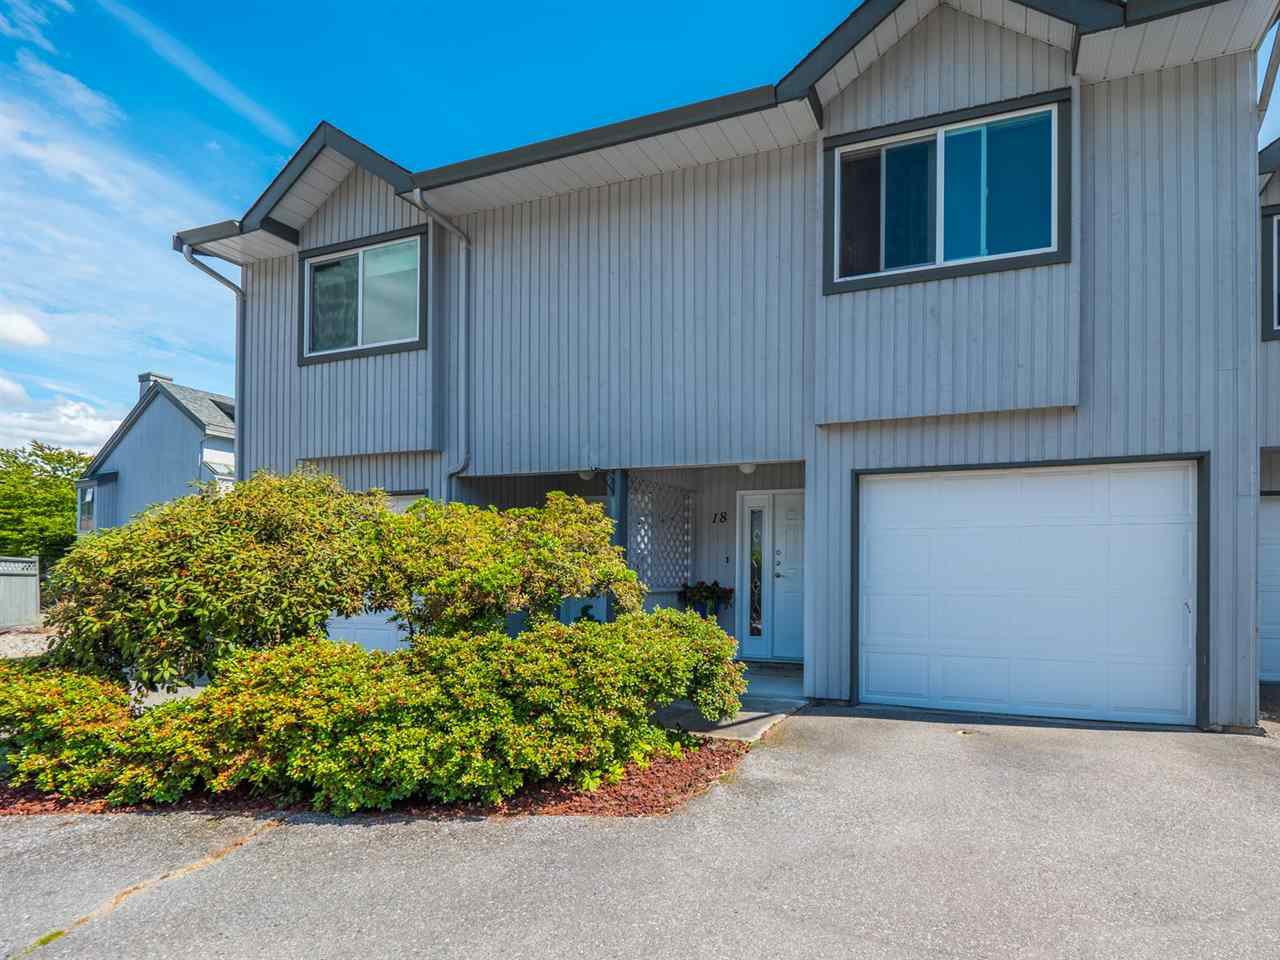 Main Photo: 18 5761 WHARF Road in Sechelt: Sechelt District Townhouse for sale (Sunshine Coast)  : MLS®# R2411016